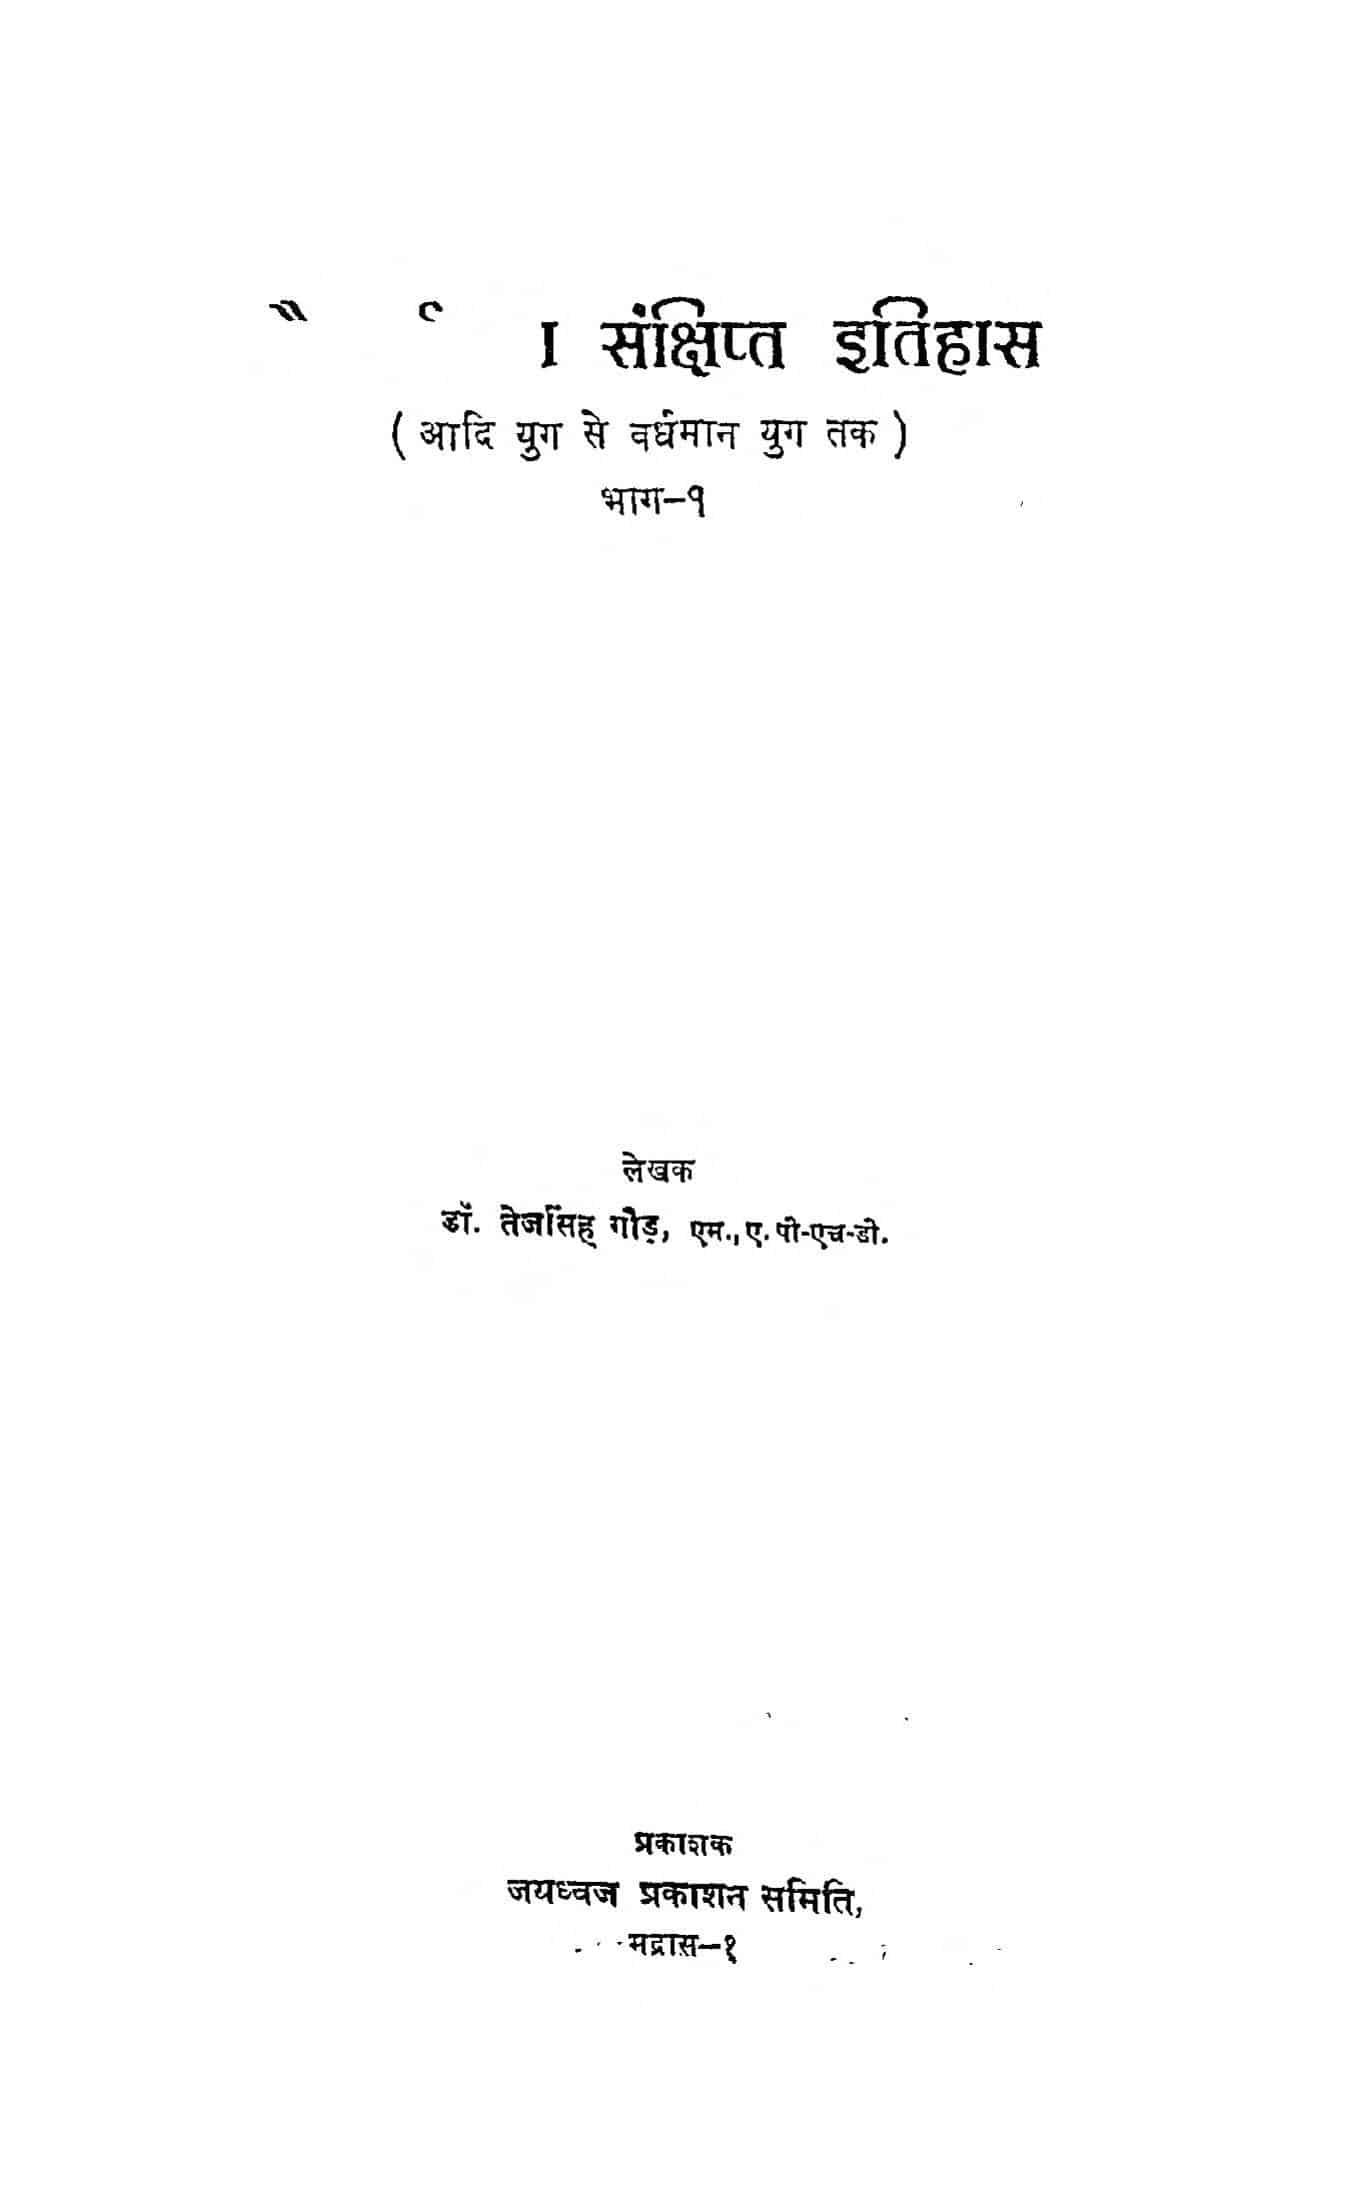 Book Image : जैन धर्म का संक्षिप्त इतिहास  - Jain Dharm Ka Snakshipt Itihas